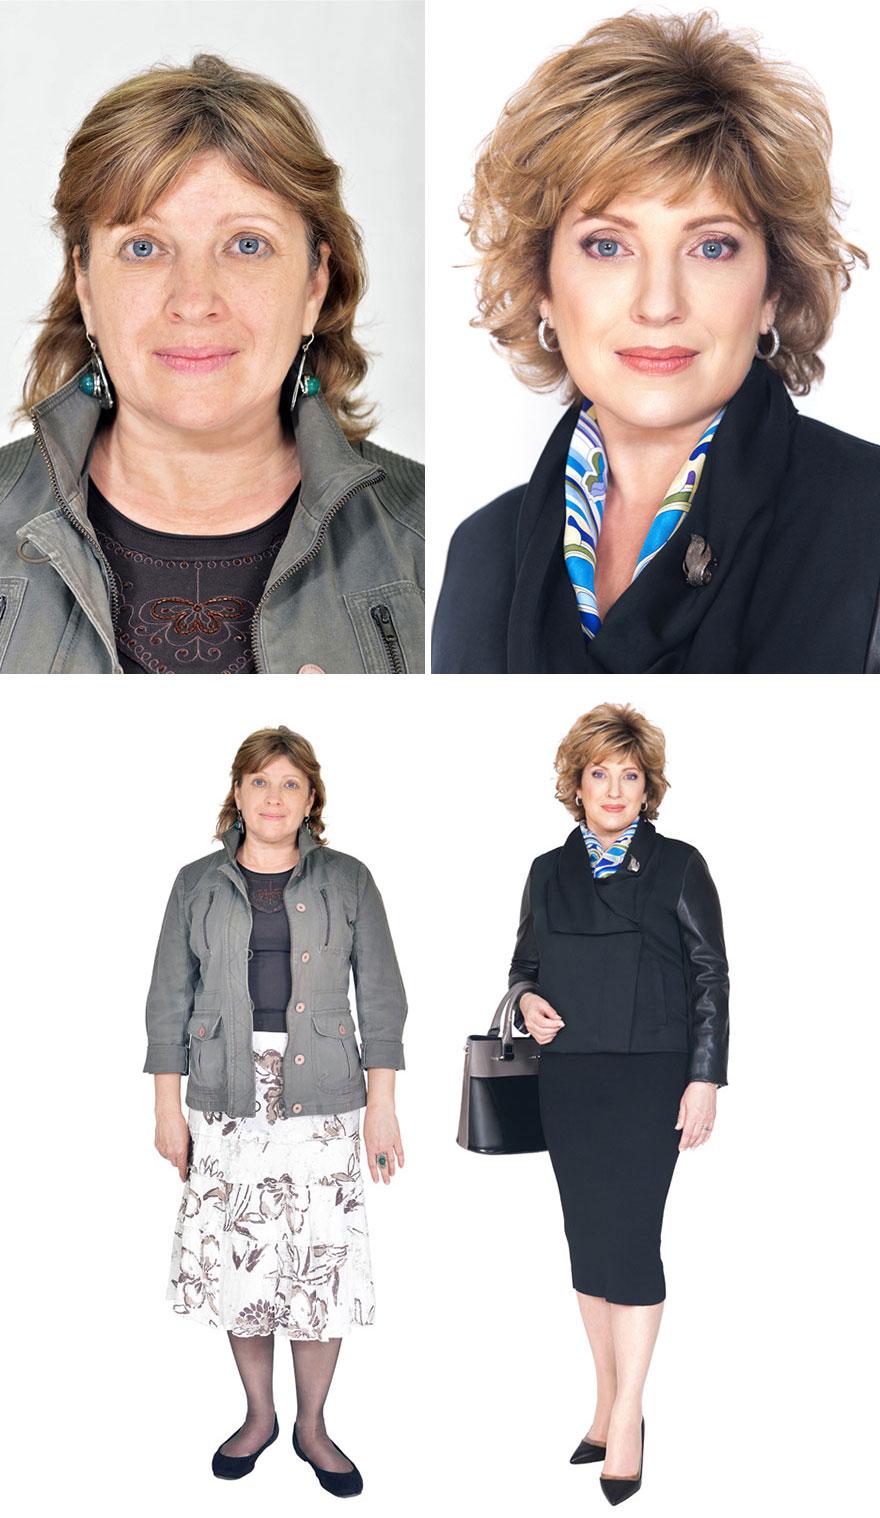 before-after-makeup-woman-style-change-konstantin-bogomolov-4